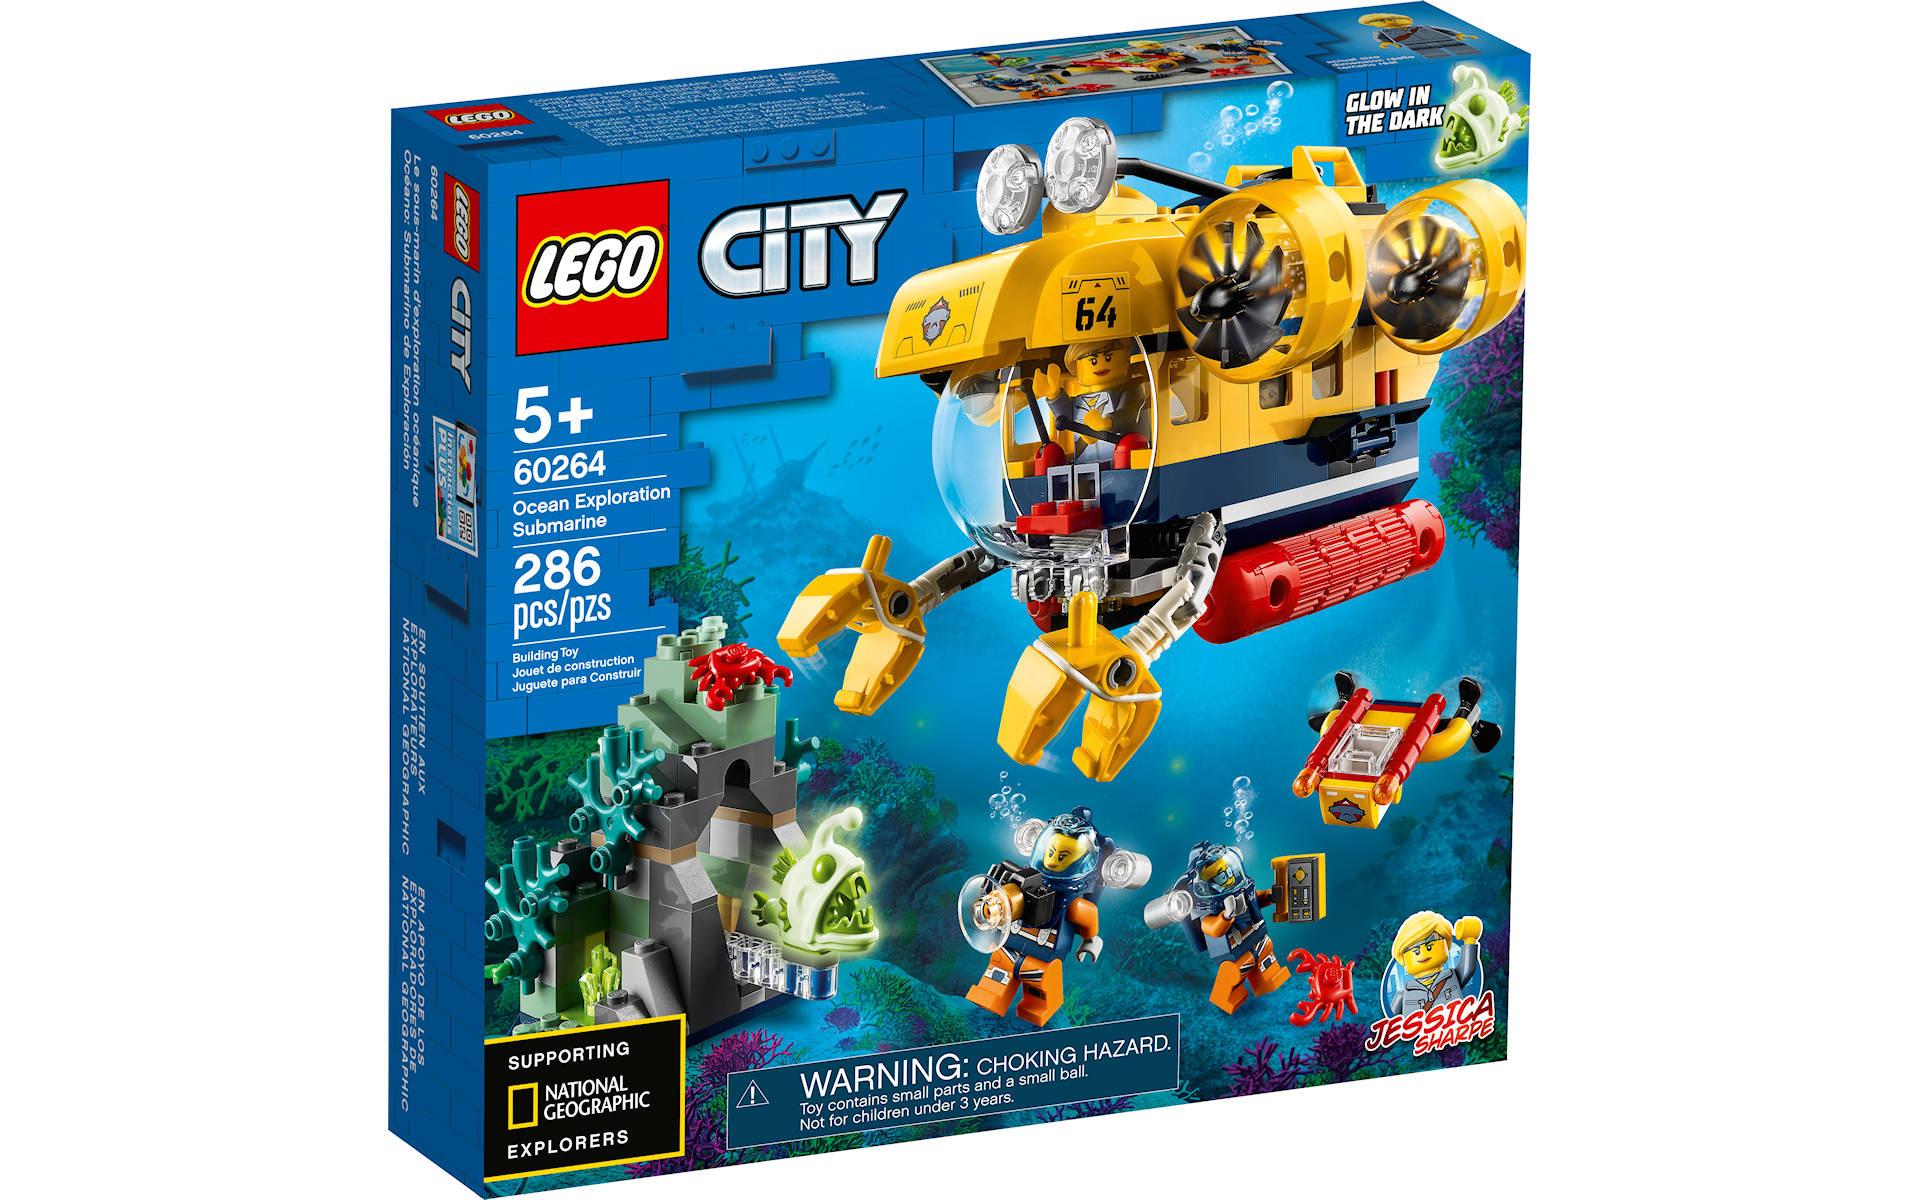 LEGO e National Geographics